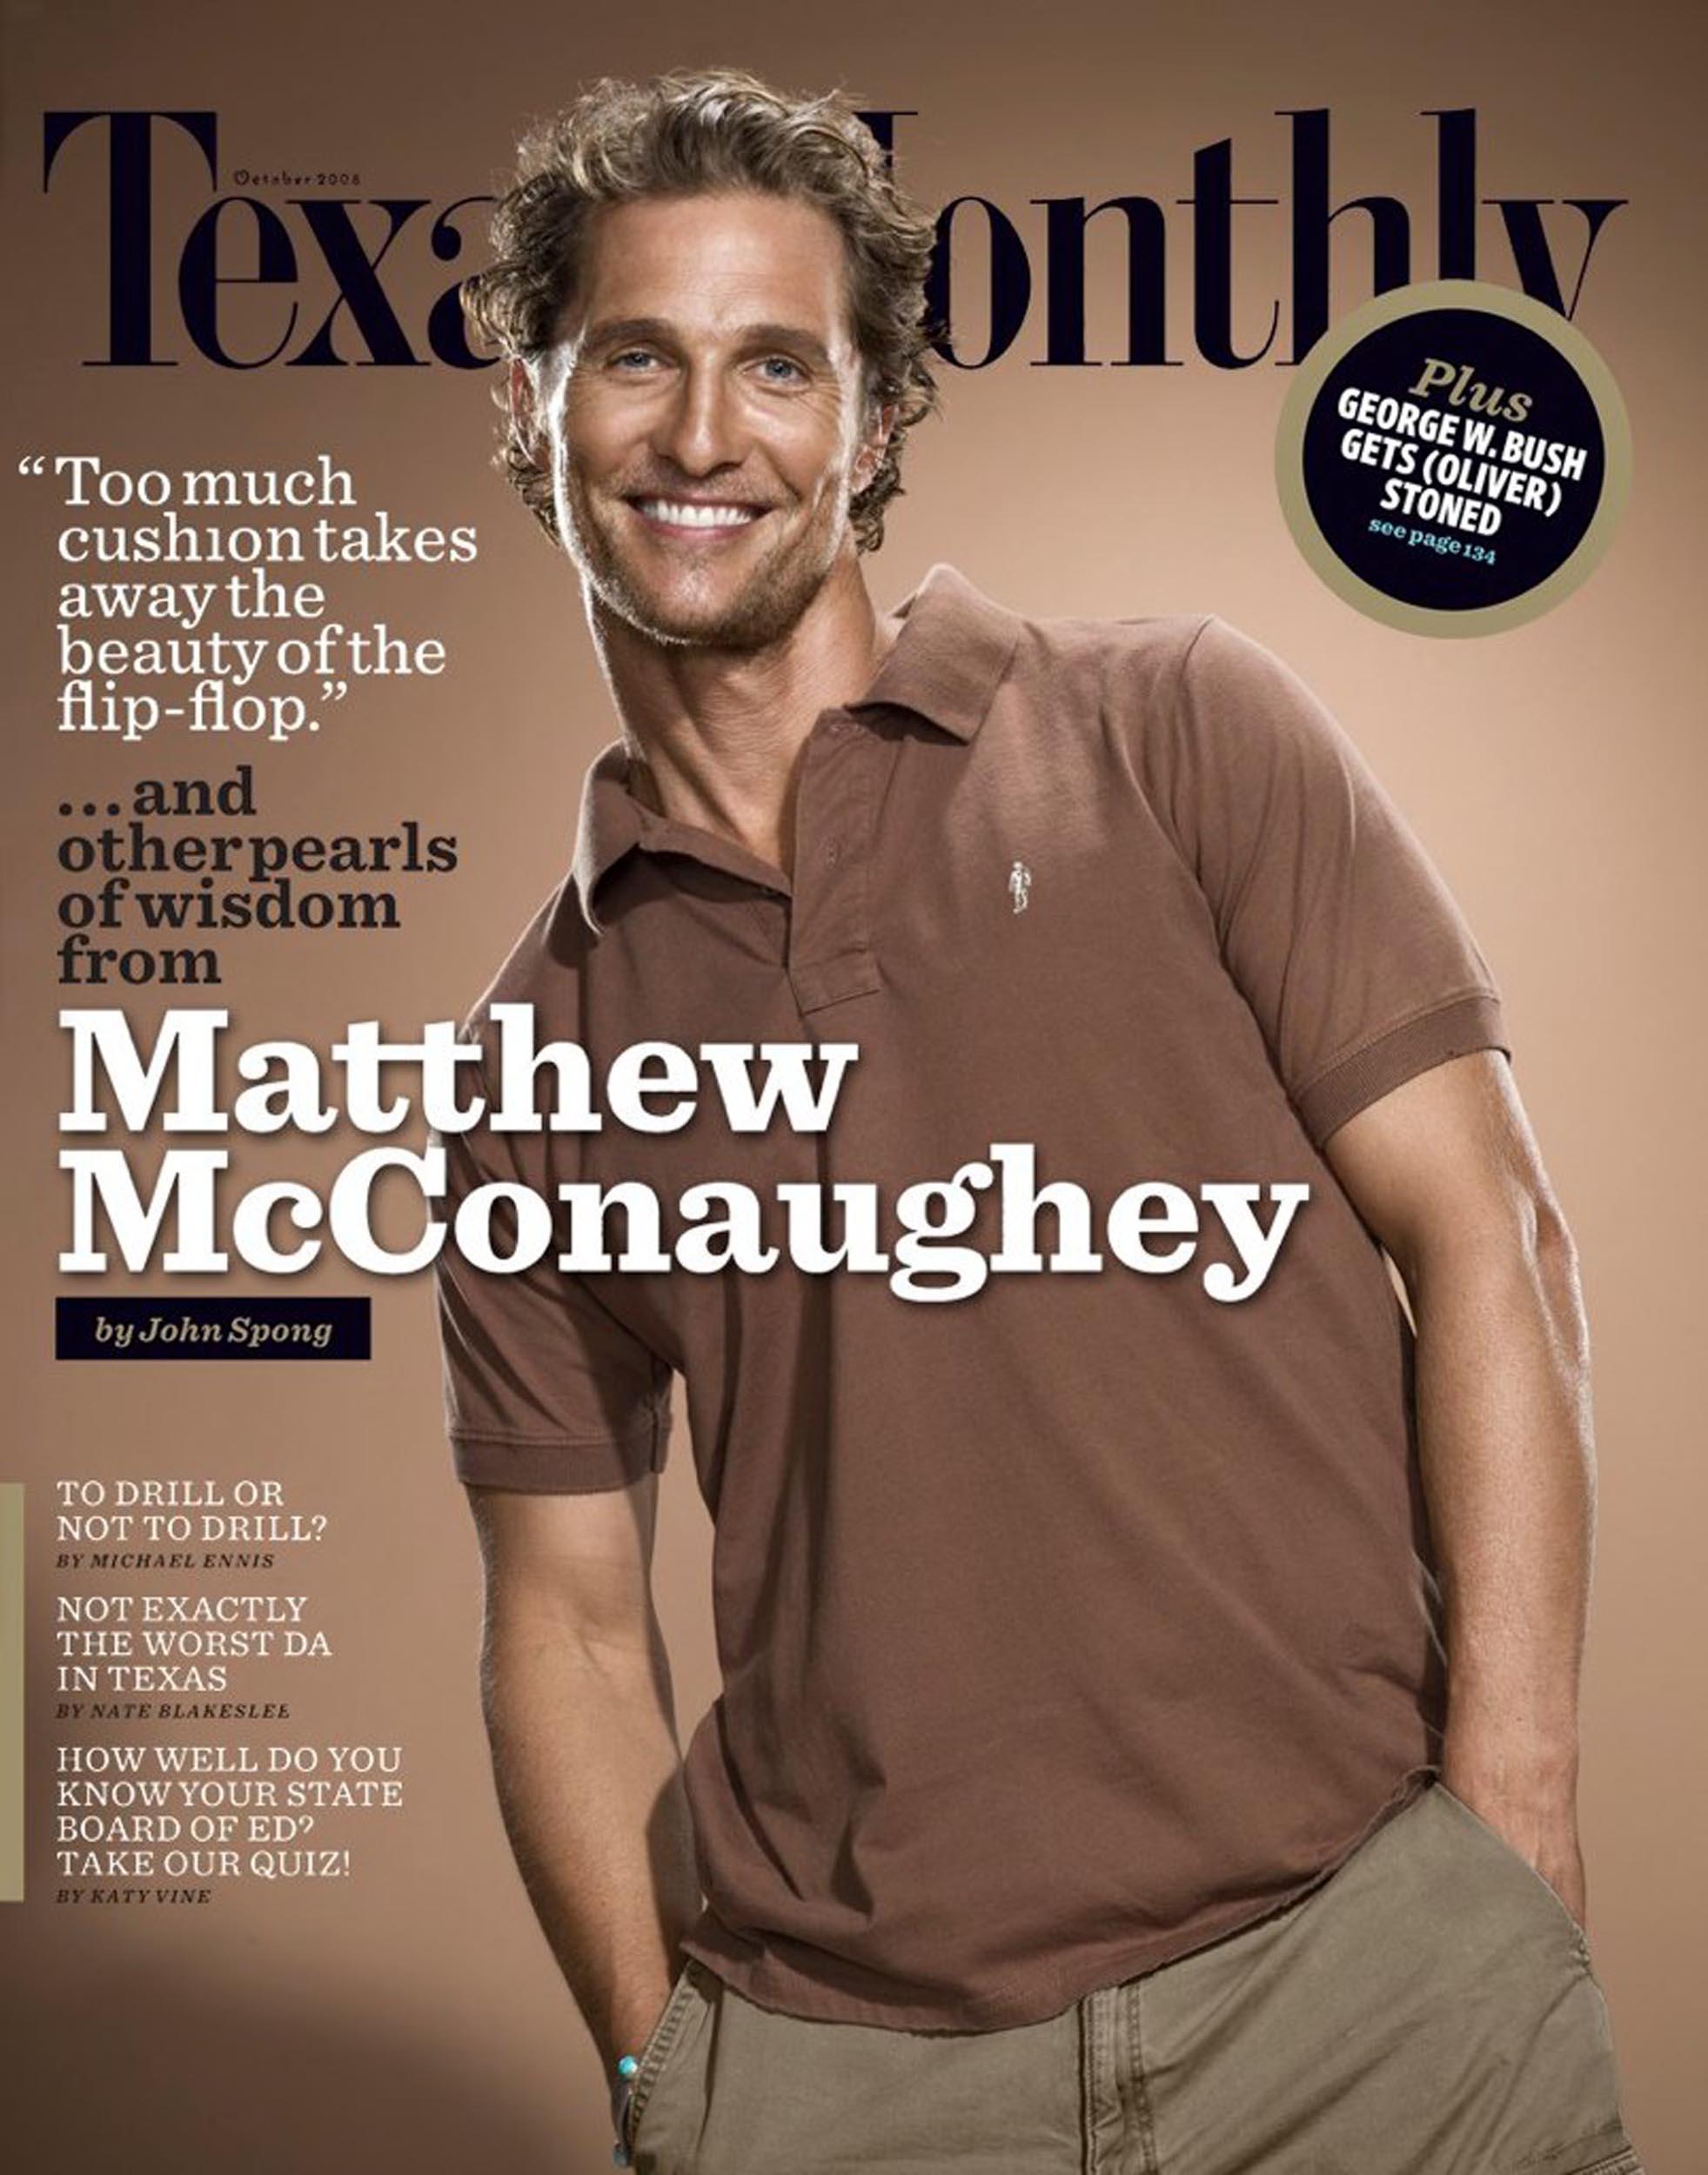 Texas Monthly - Matthew McConaughey